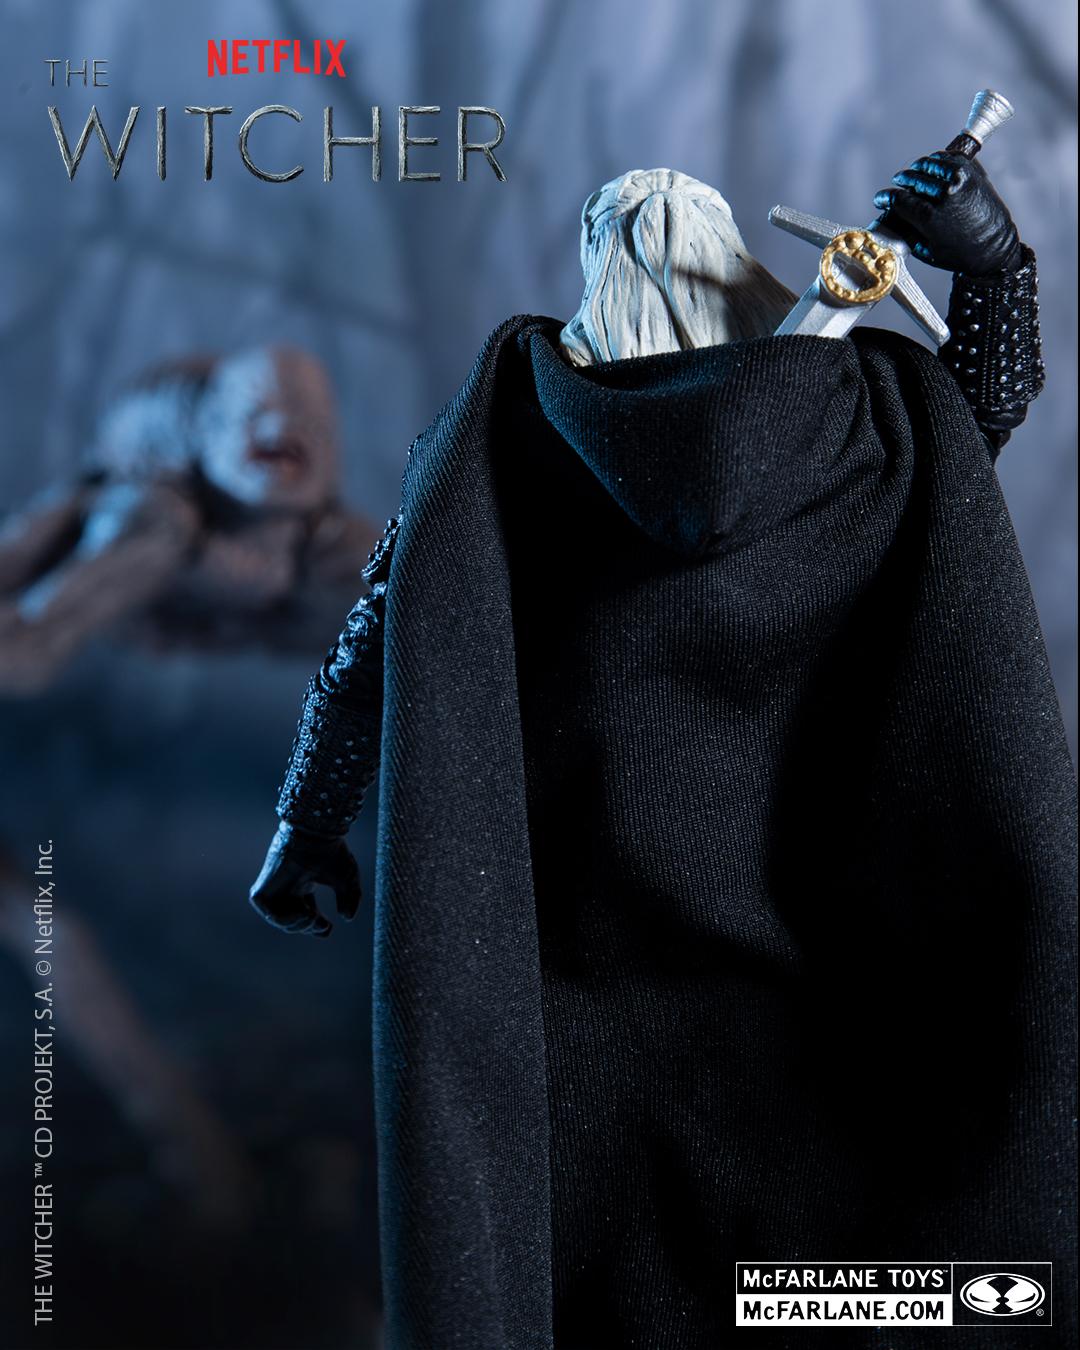 The_Witcher_Netflix_McFarlane_Toys_Teaser_rev1